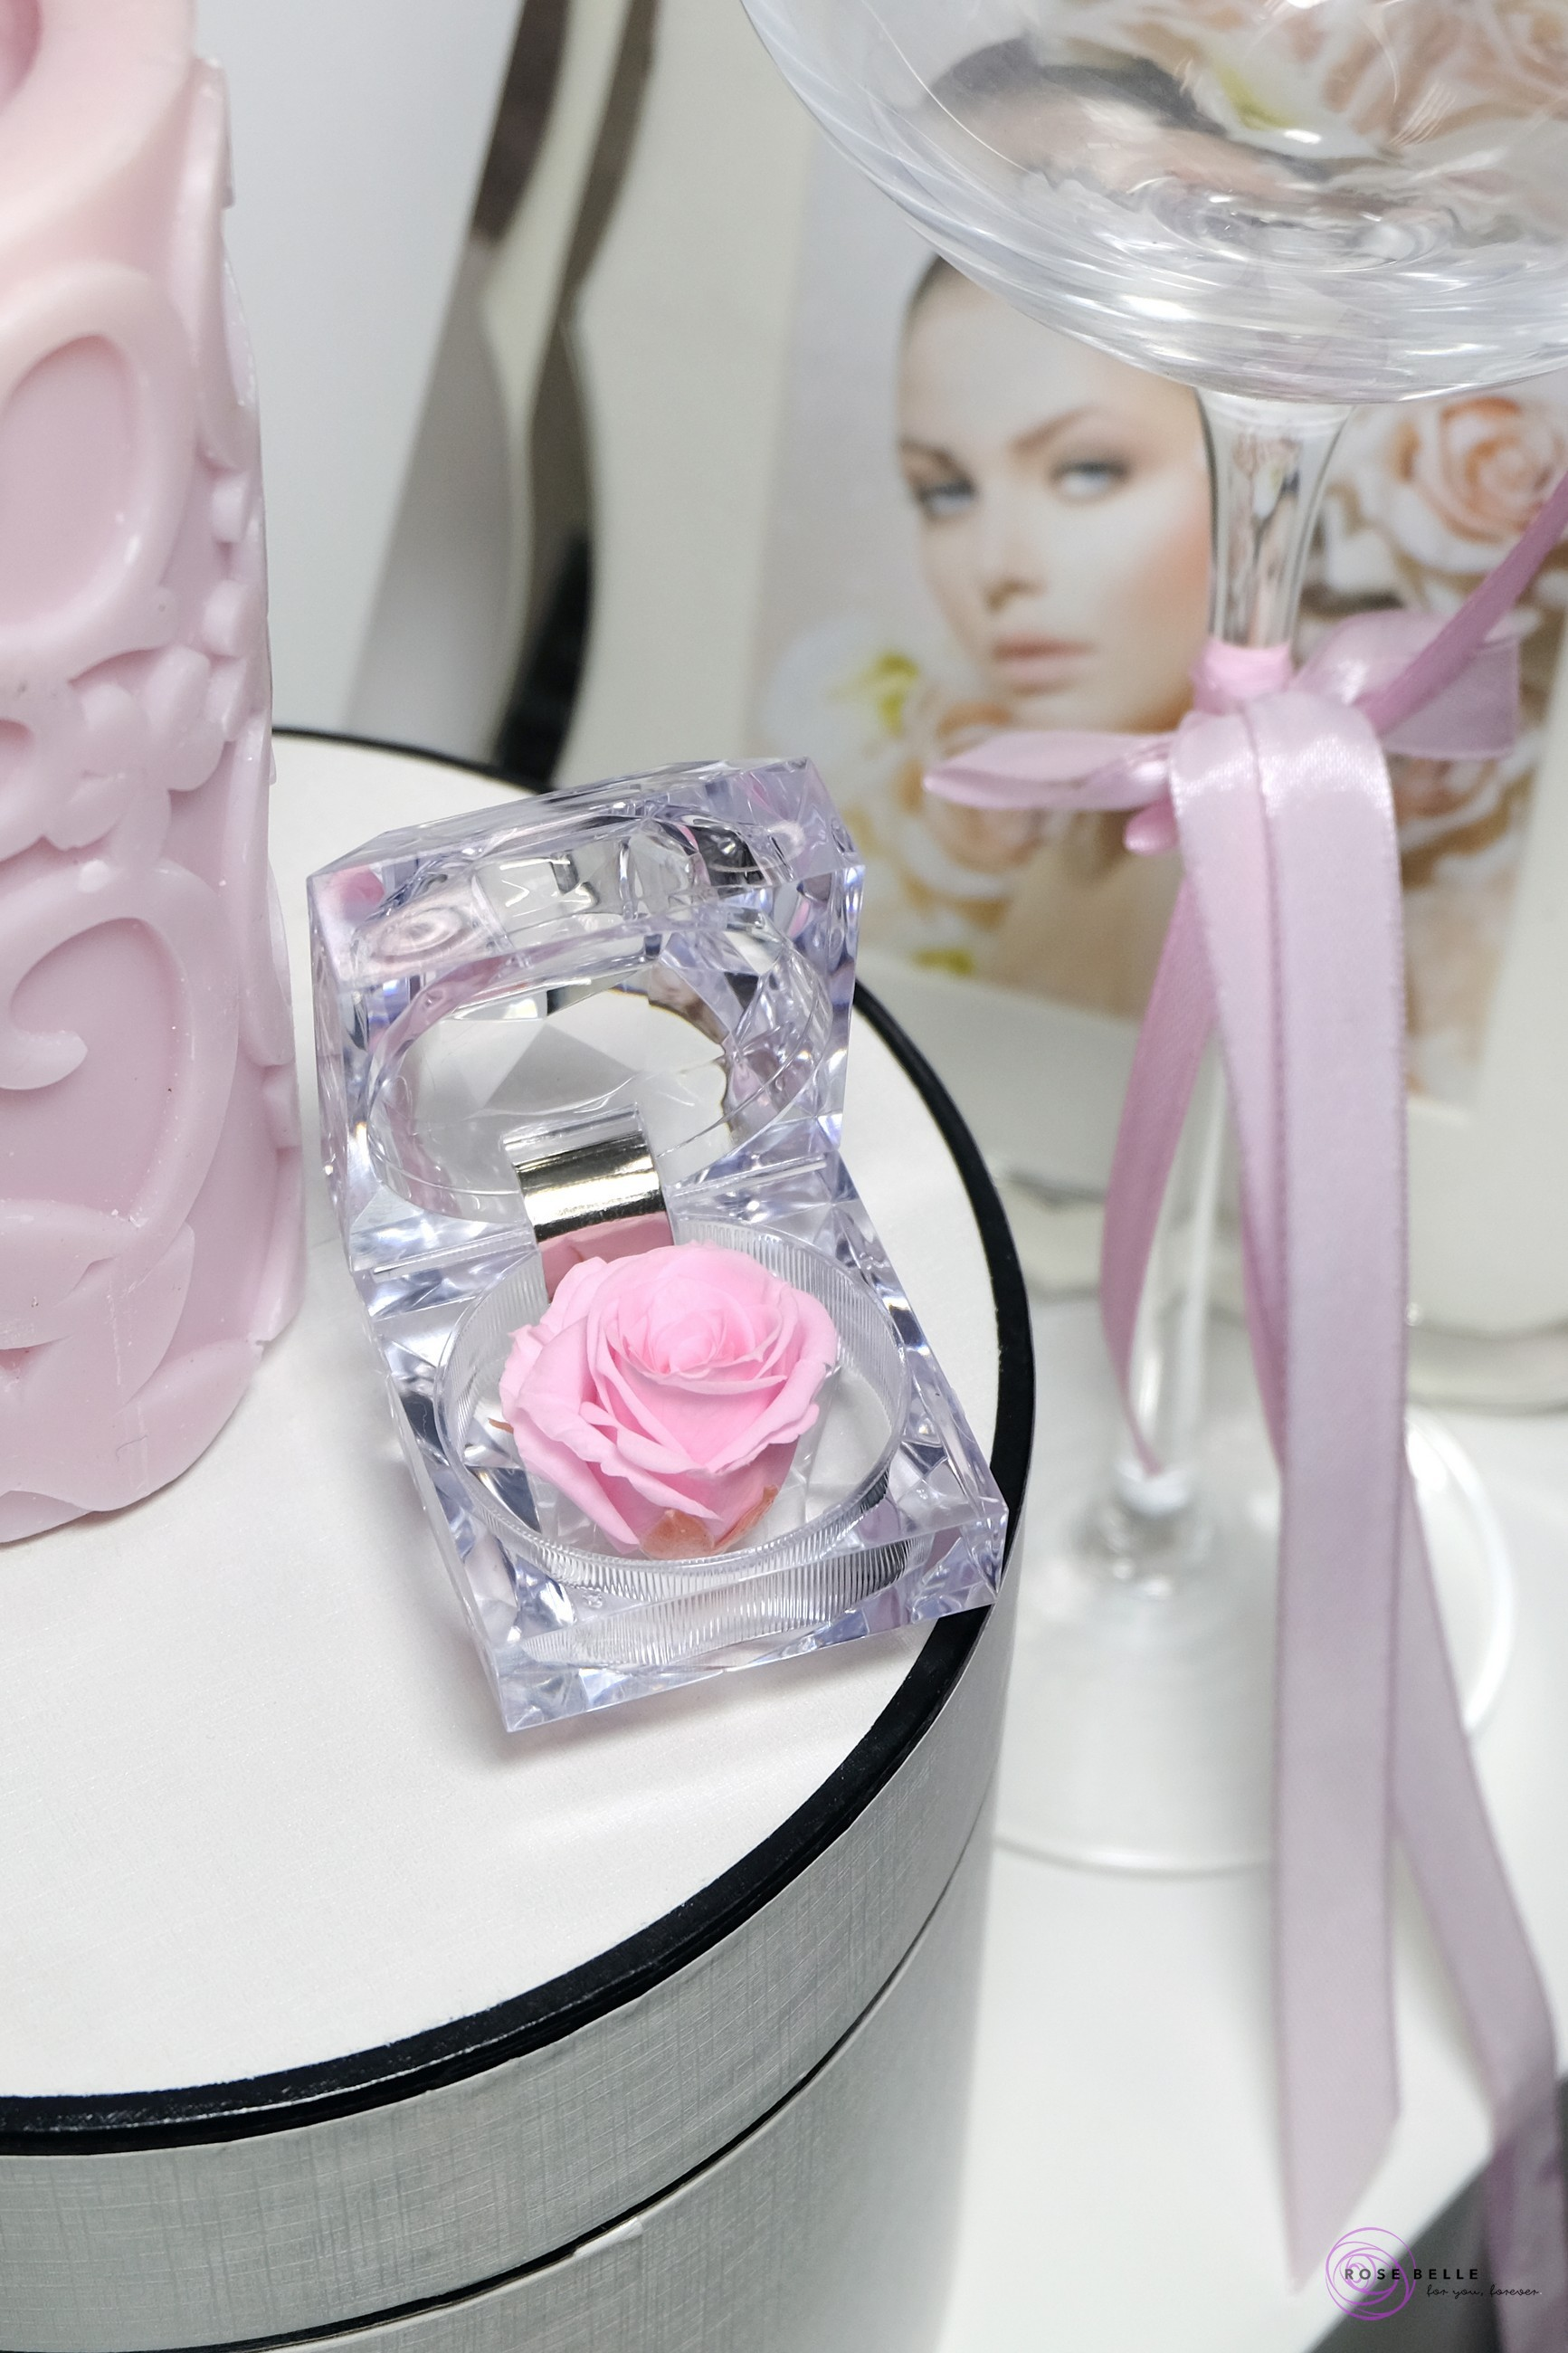 Rose Belle prezent dla każdego